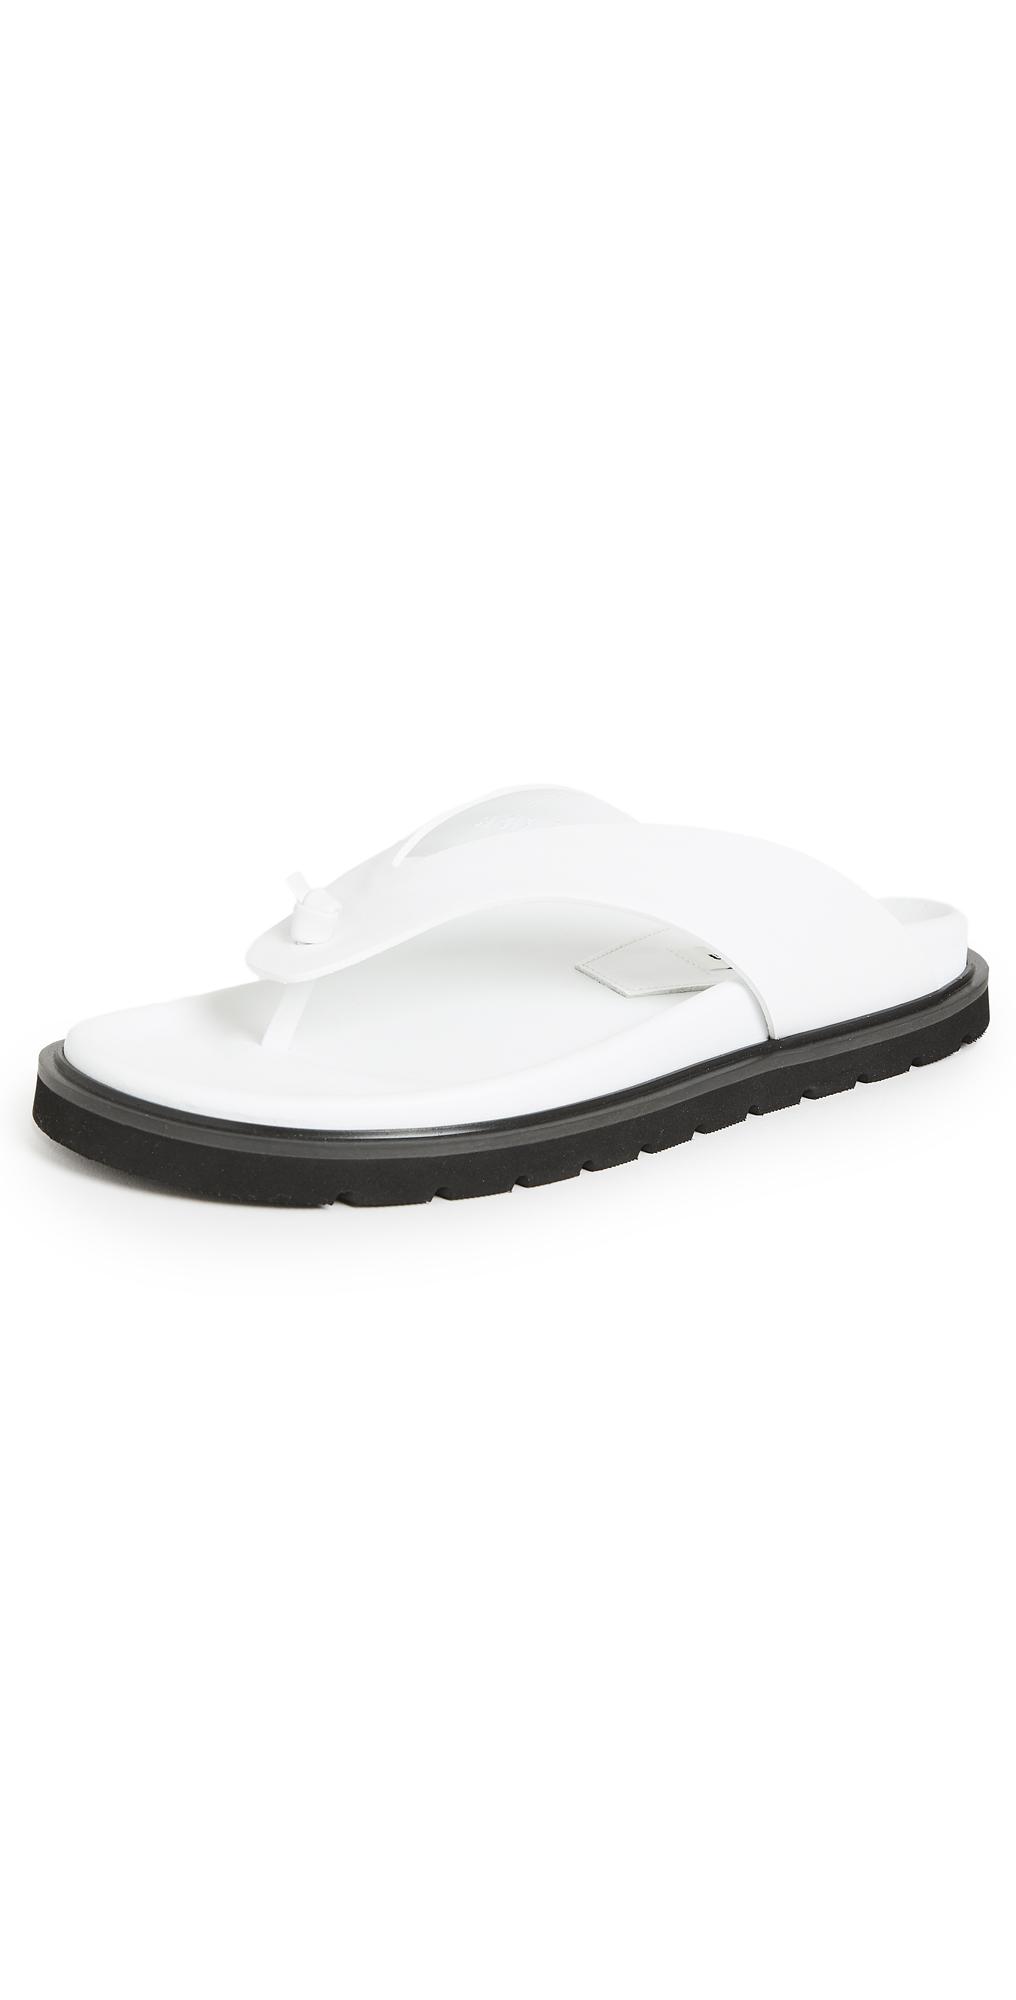 Reike Nen T Flip-Flop Mold Sandals